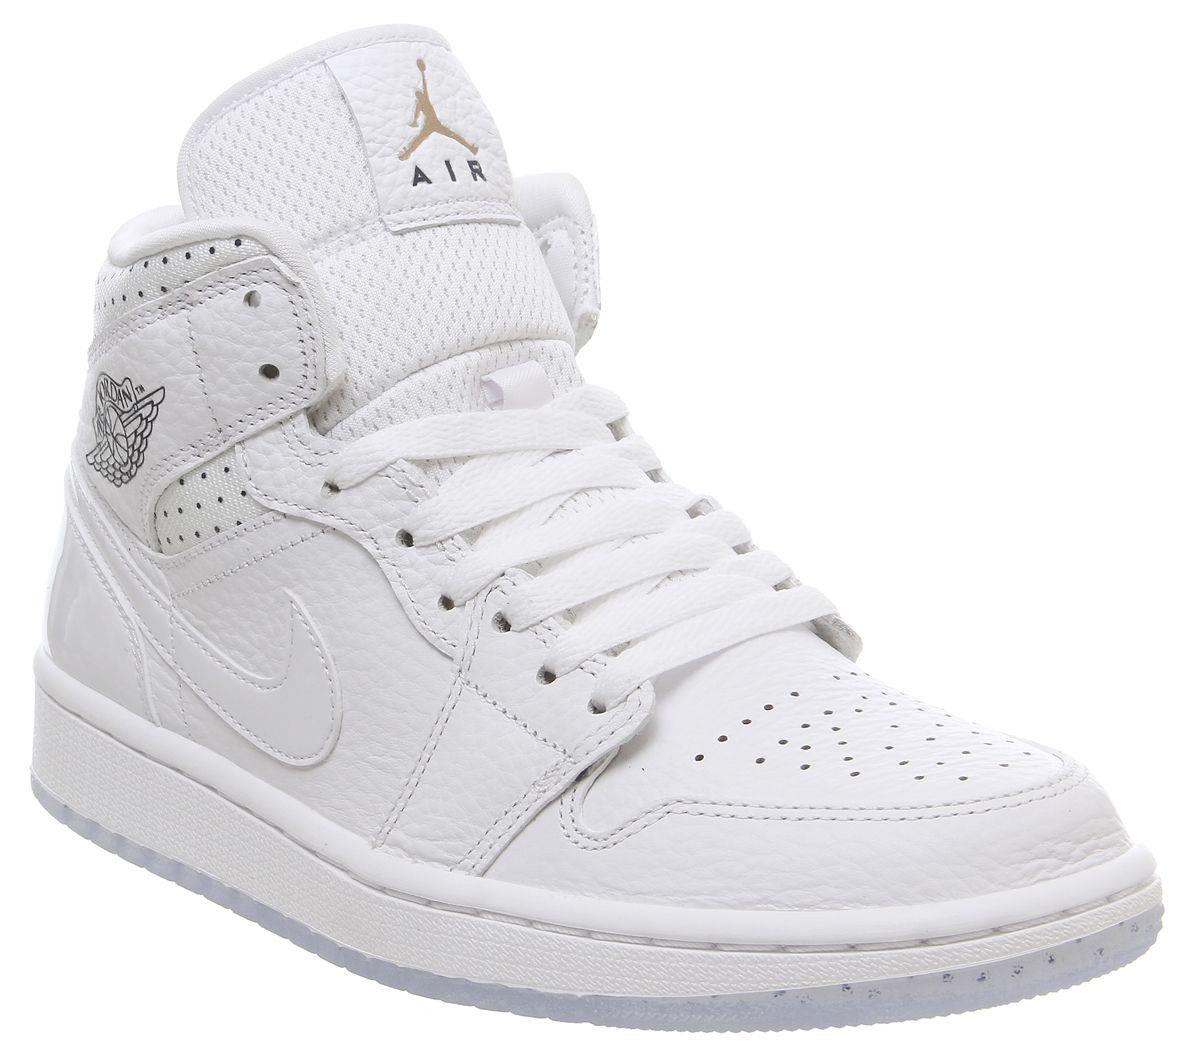 chaussures de sport f534a 1671f Jordan Air Jordan 1 Mid Trainers White Midnight Navy Rose ...